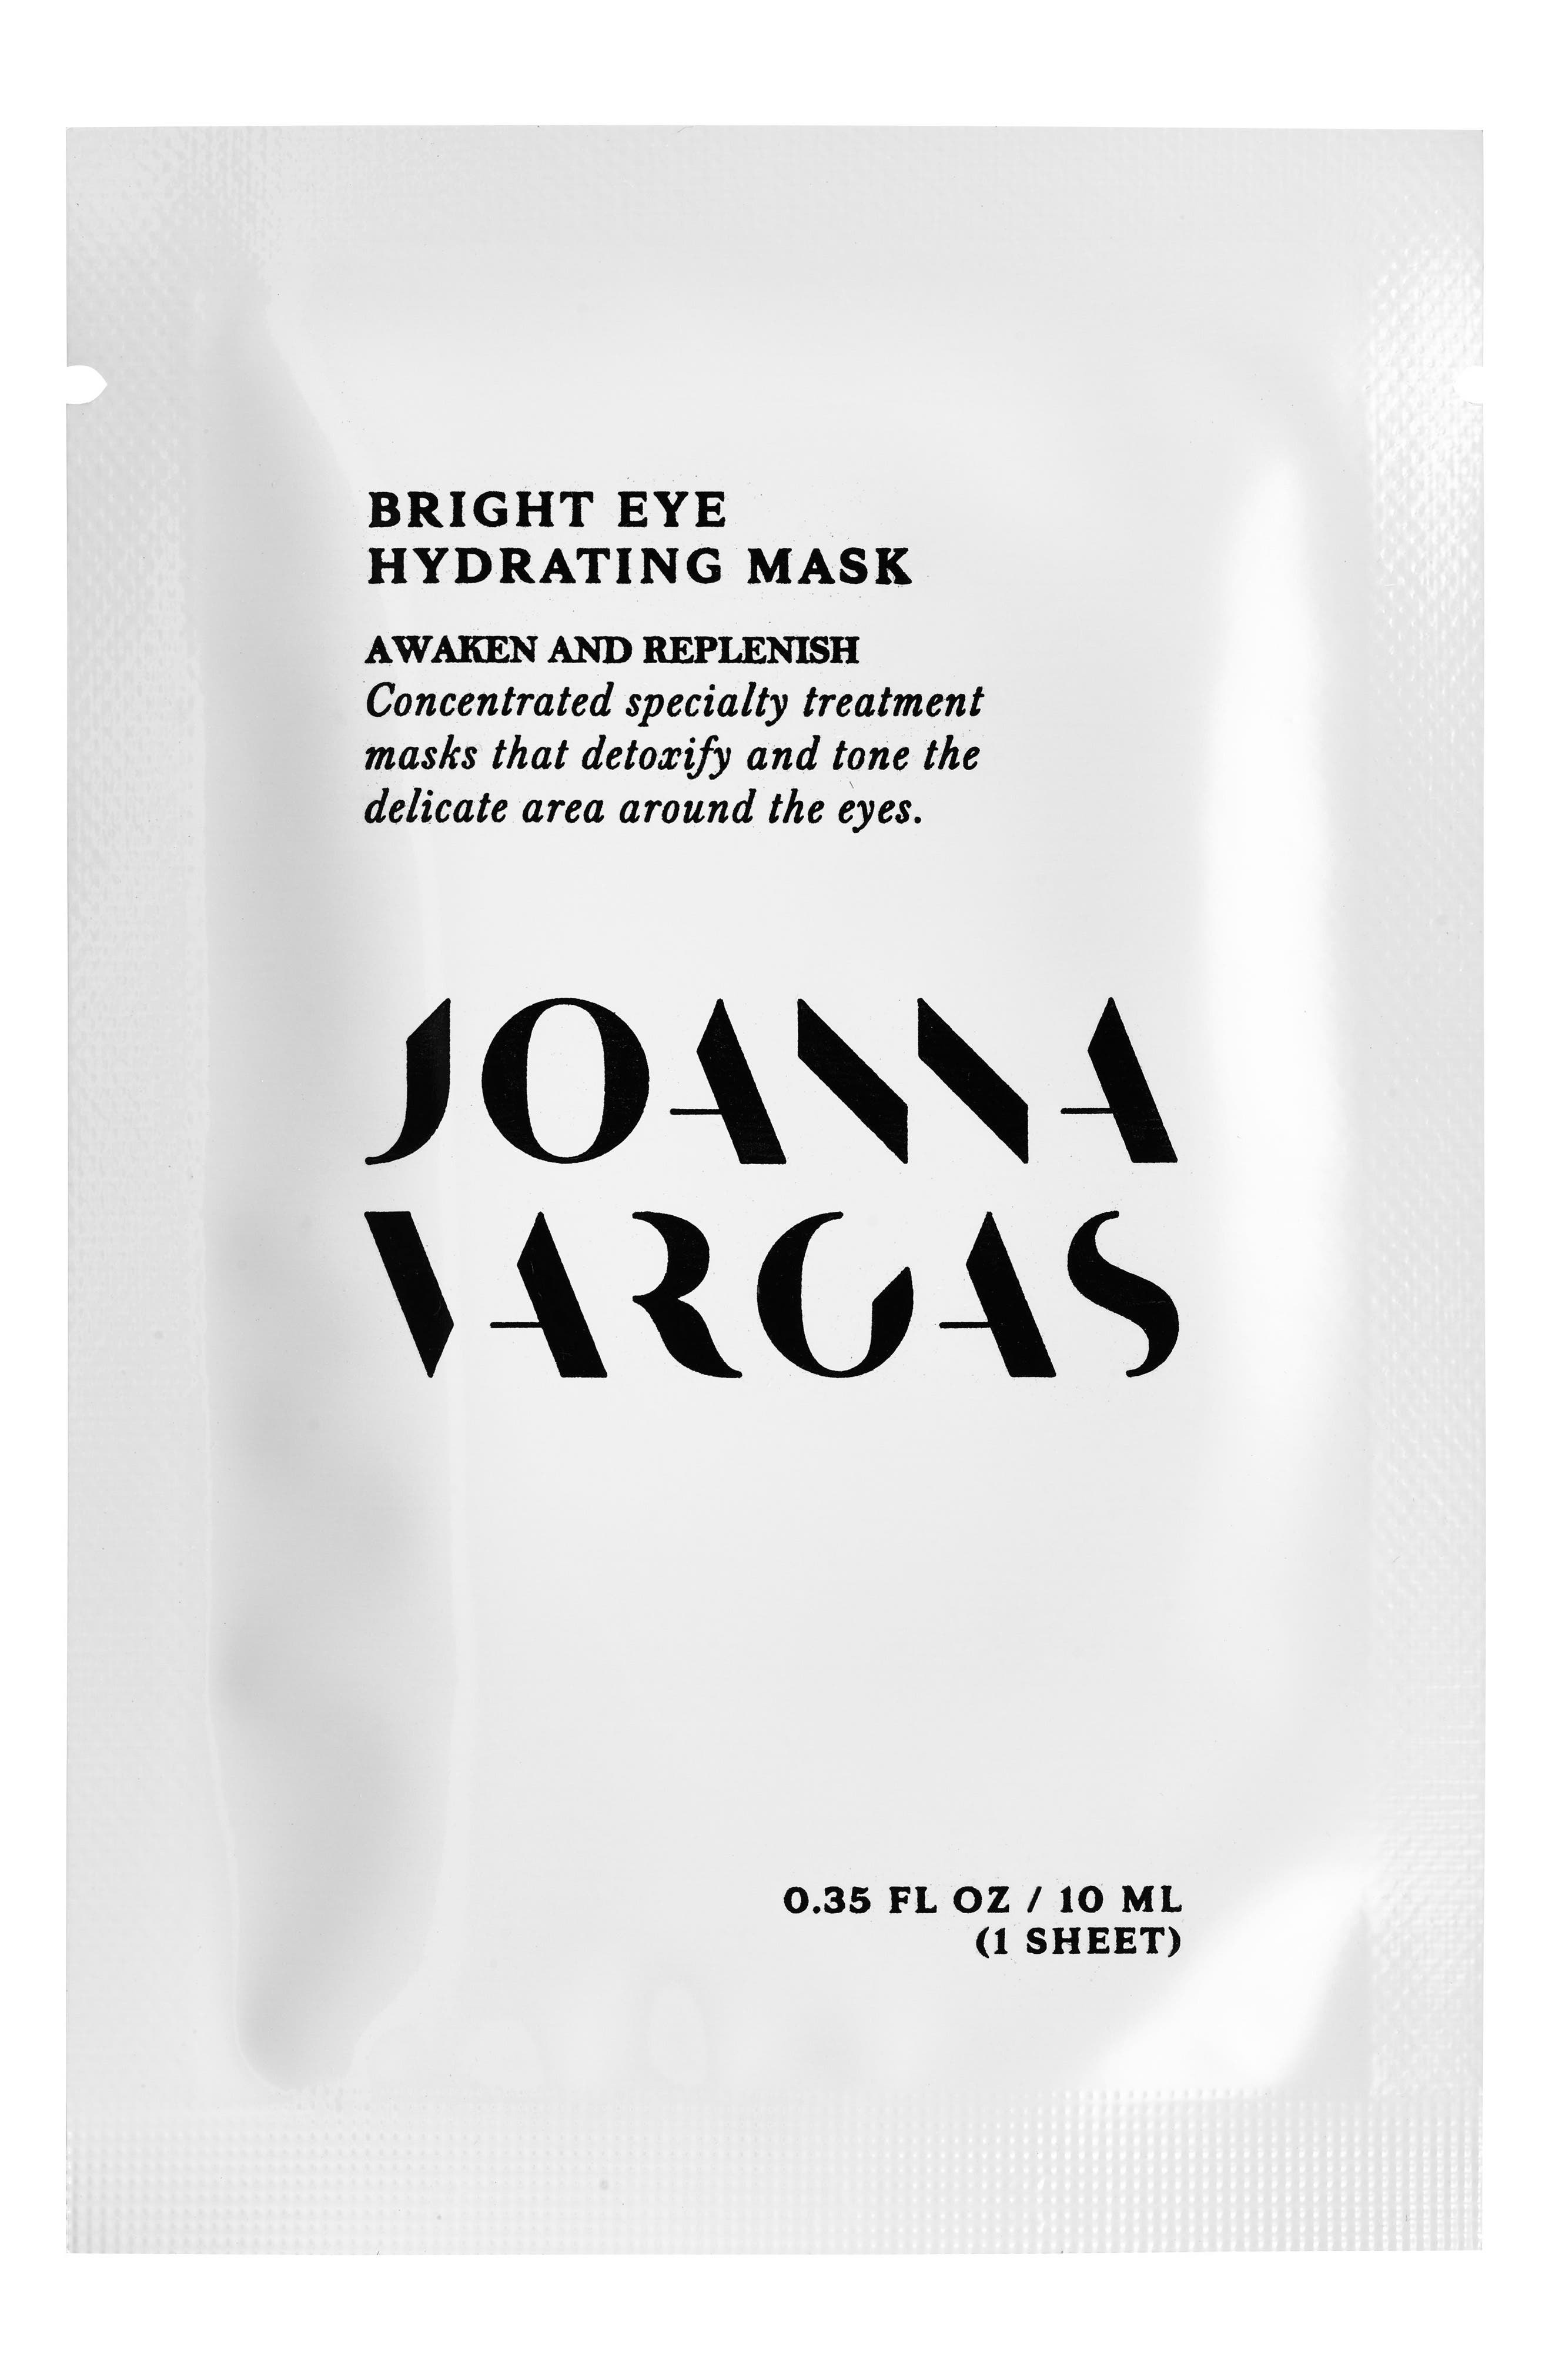 Alternate Image 1 Selected - Joanna Vargas Bright Eye Hydrating Mask